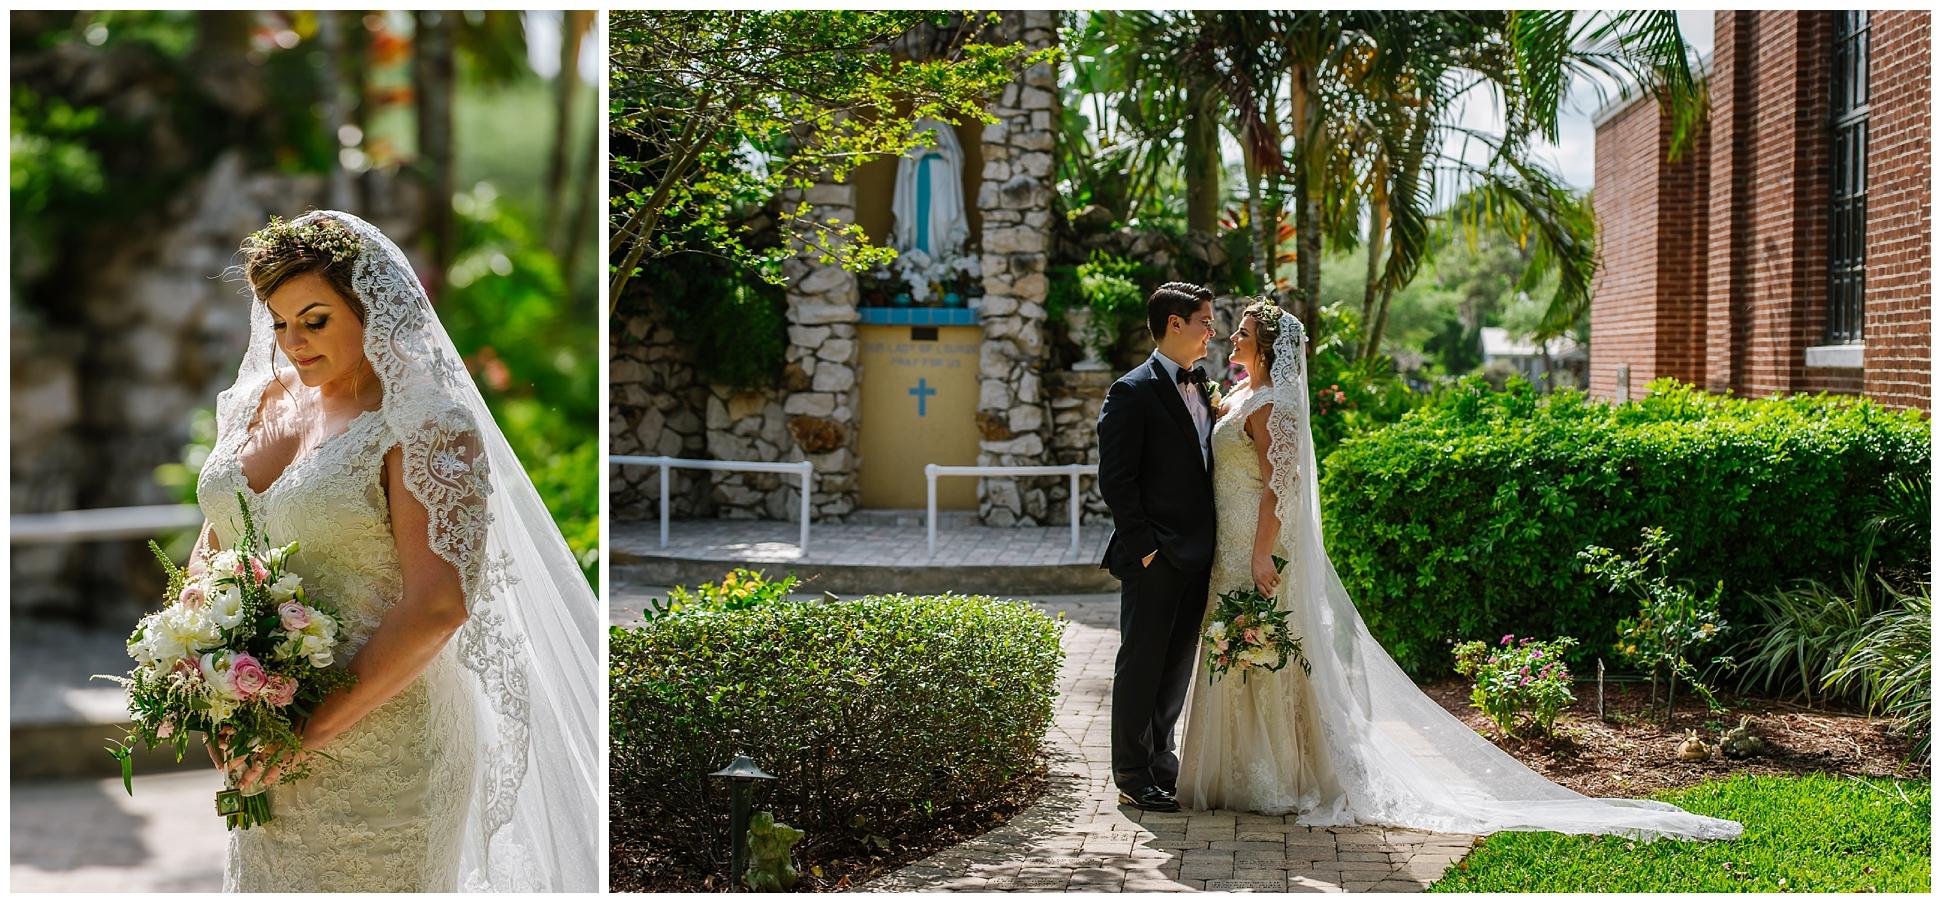 st-pete-wedding-photographer-italian-romance-theme-rustic-flower-crown_0406.jpg